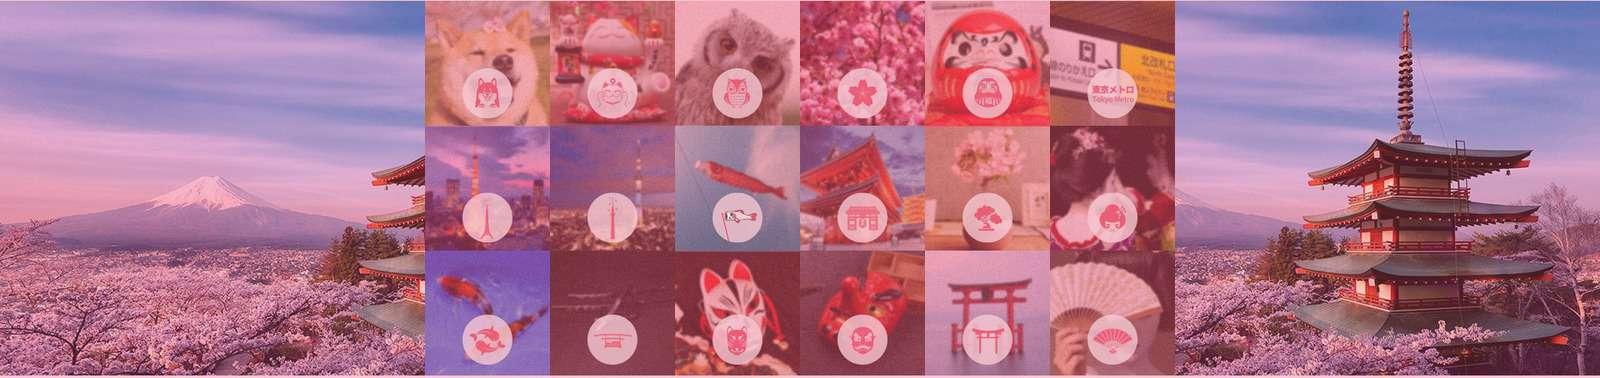 Ban Phim Co Akko 3068 V2 World Tour Tokyo R2 Rgb Bluetooth 5.0 071